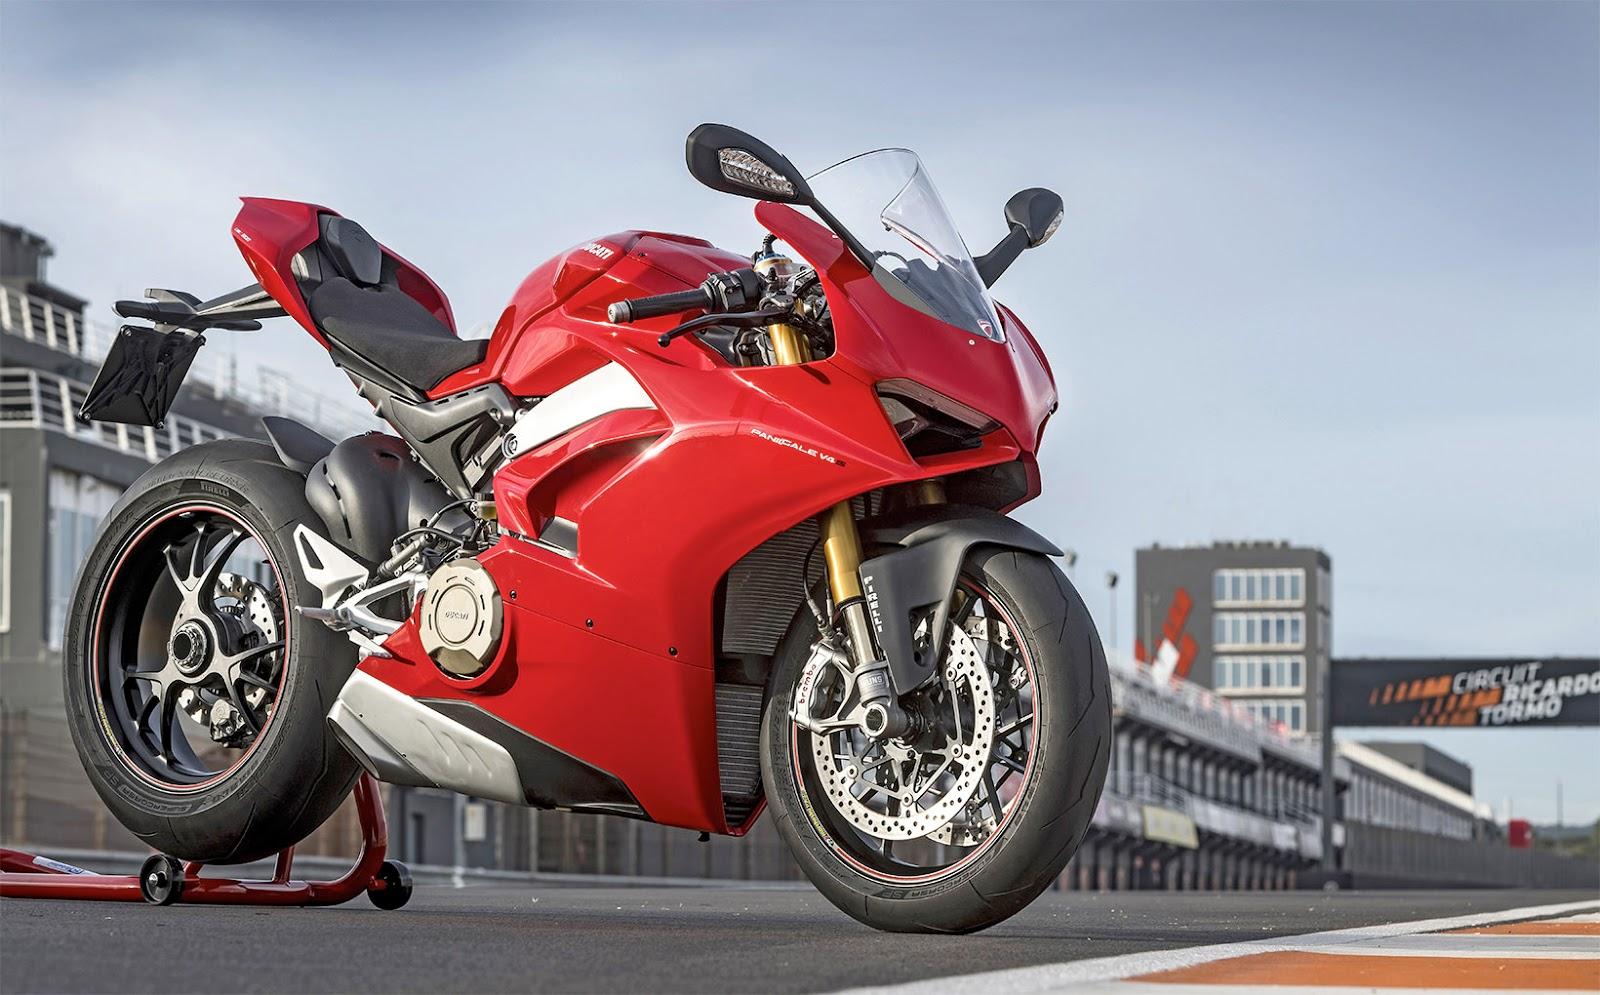 Ducati Workshop Manuals Resource